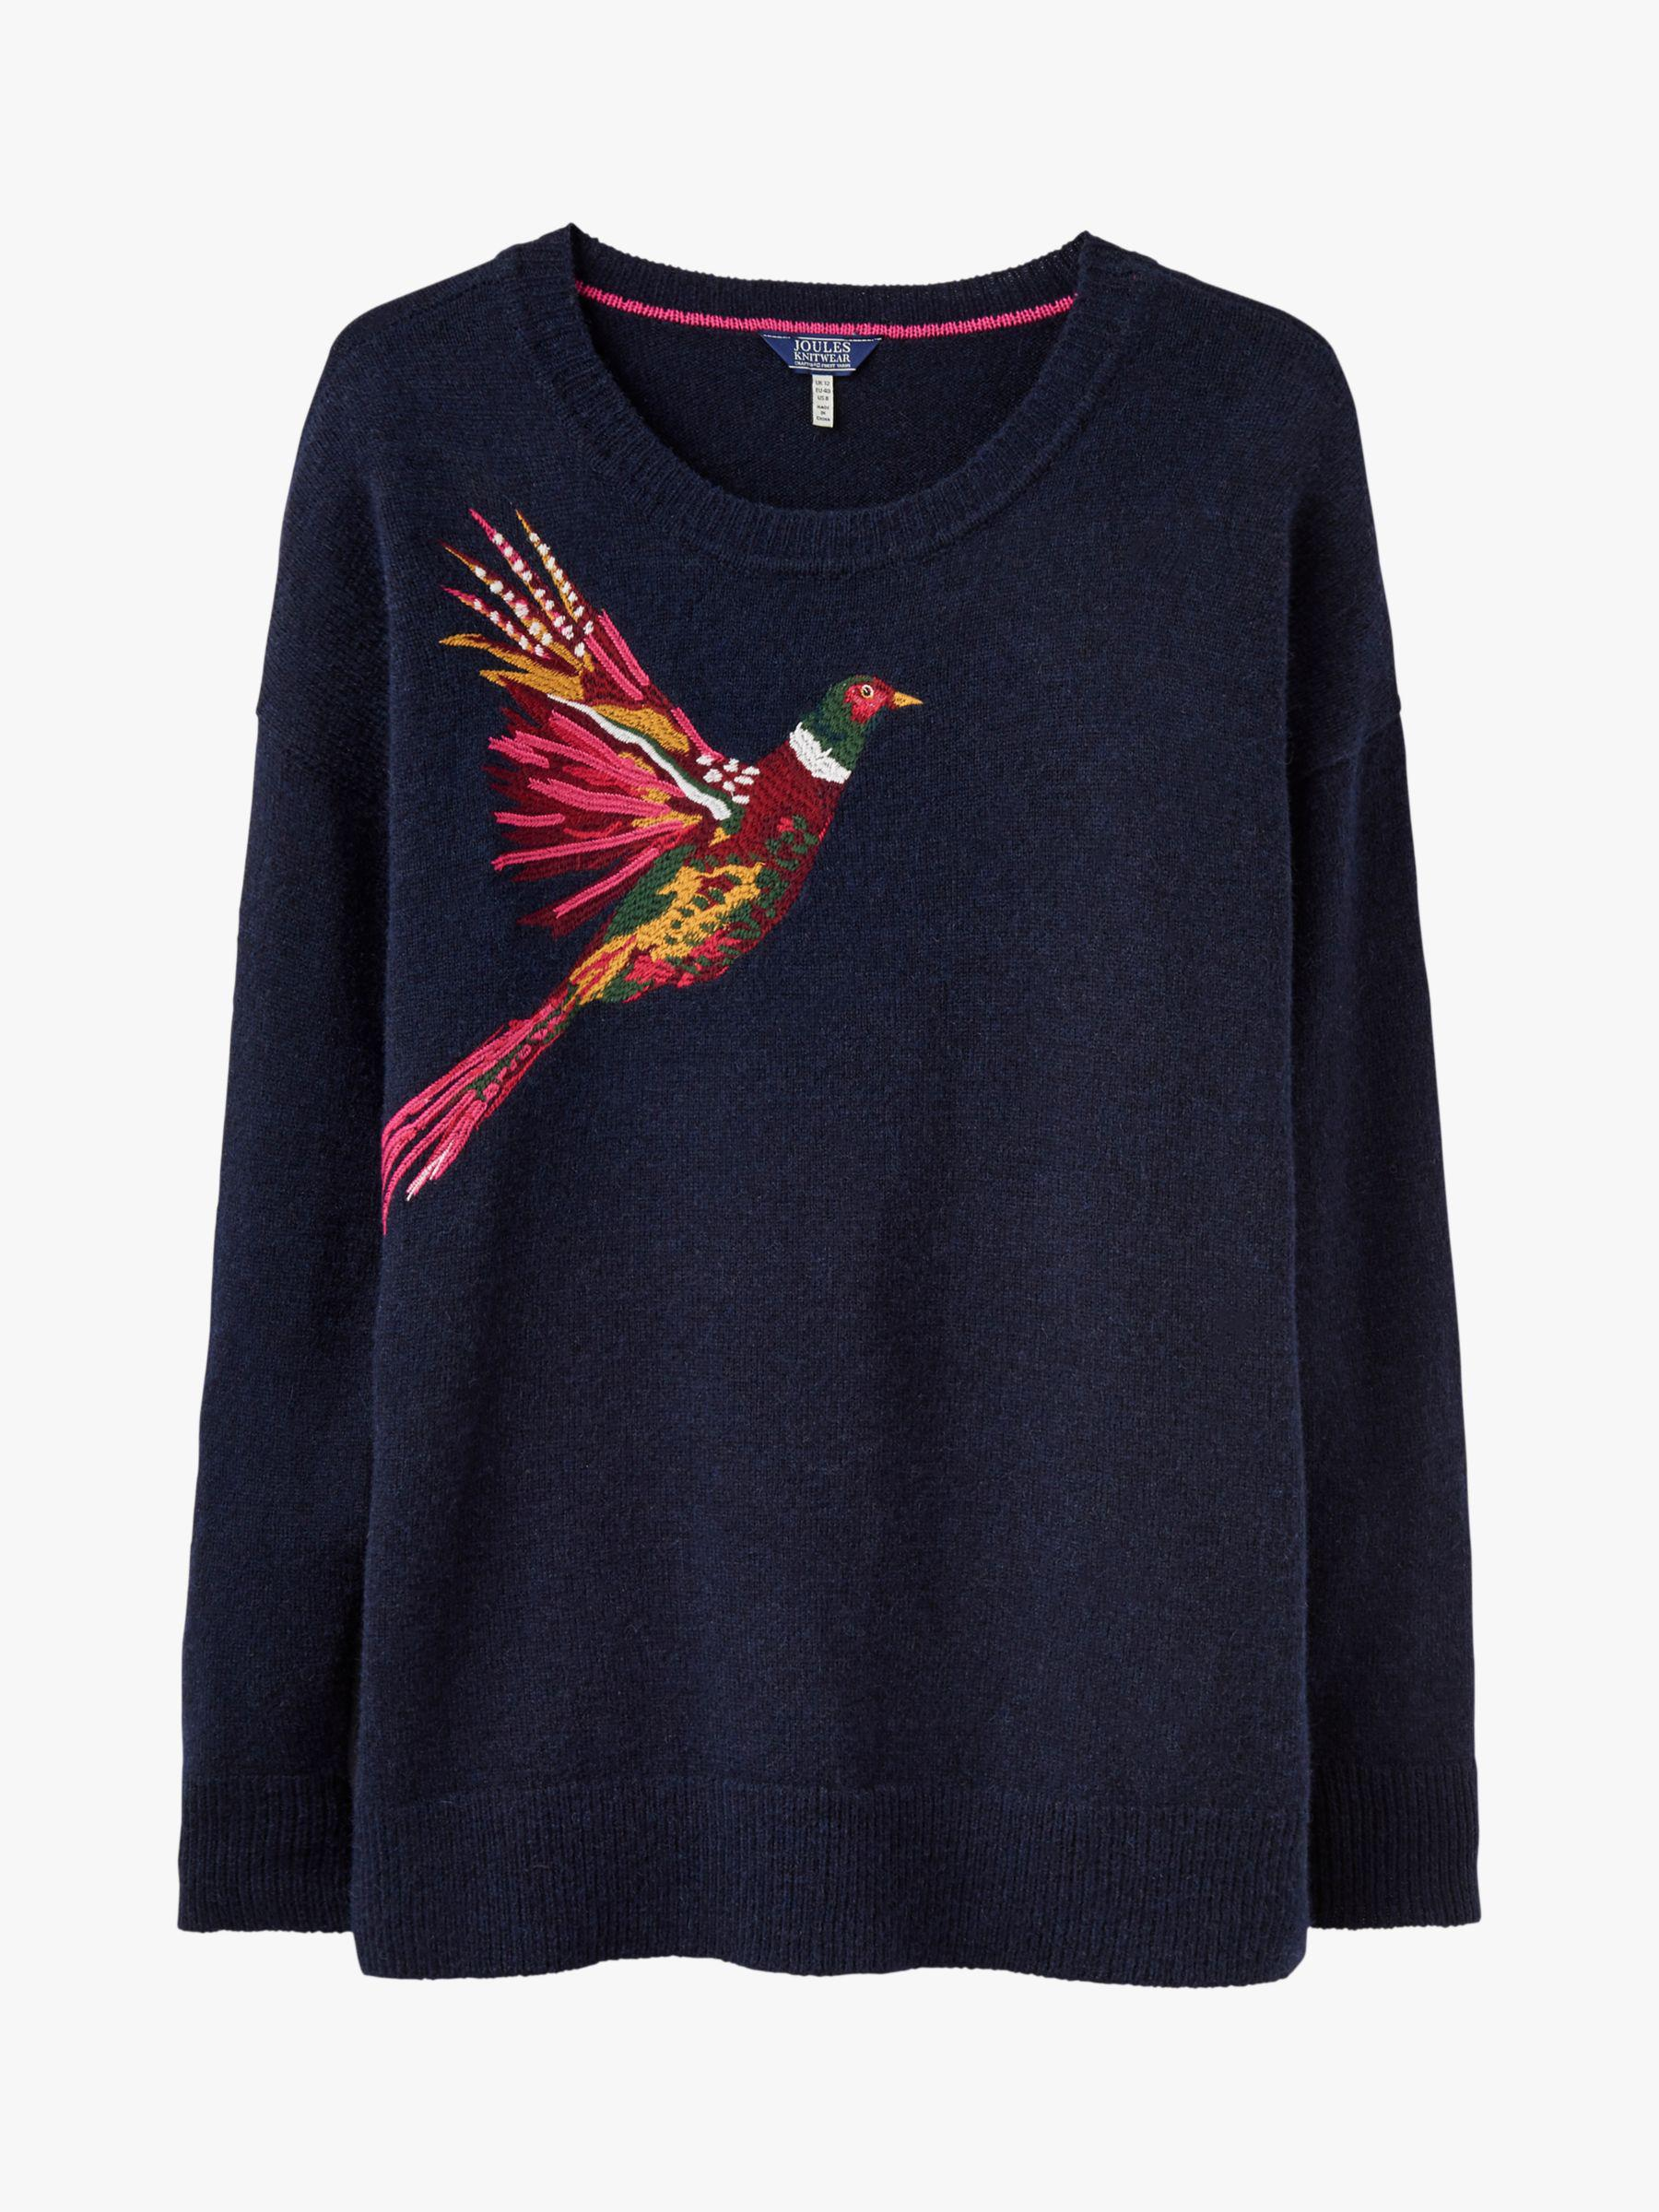 Joules Womens Meryl Intarsia Jumper in Grey Marl Pheasant Embroidery